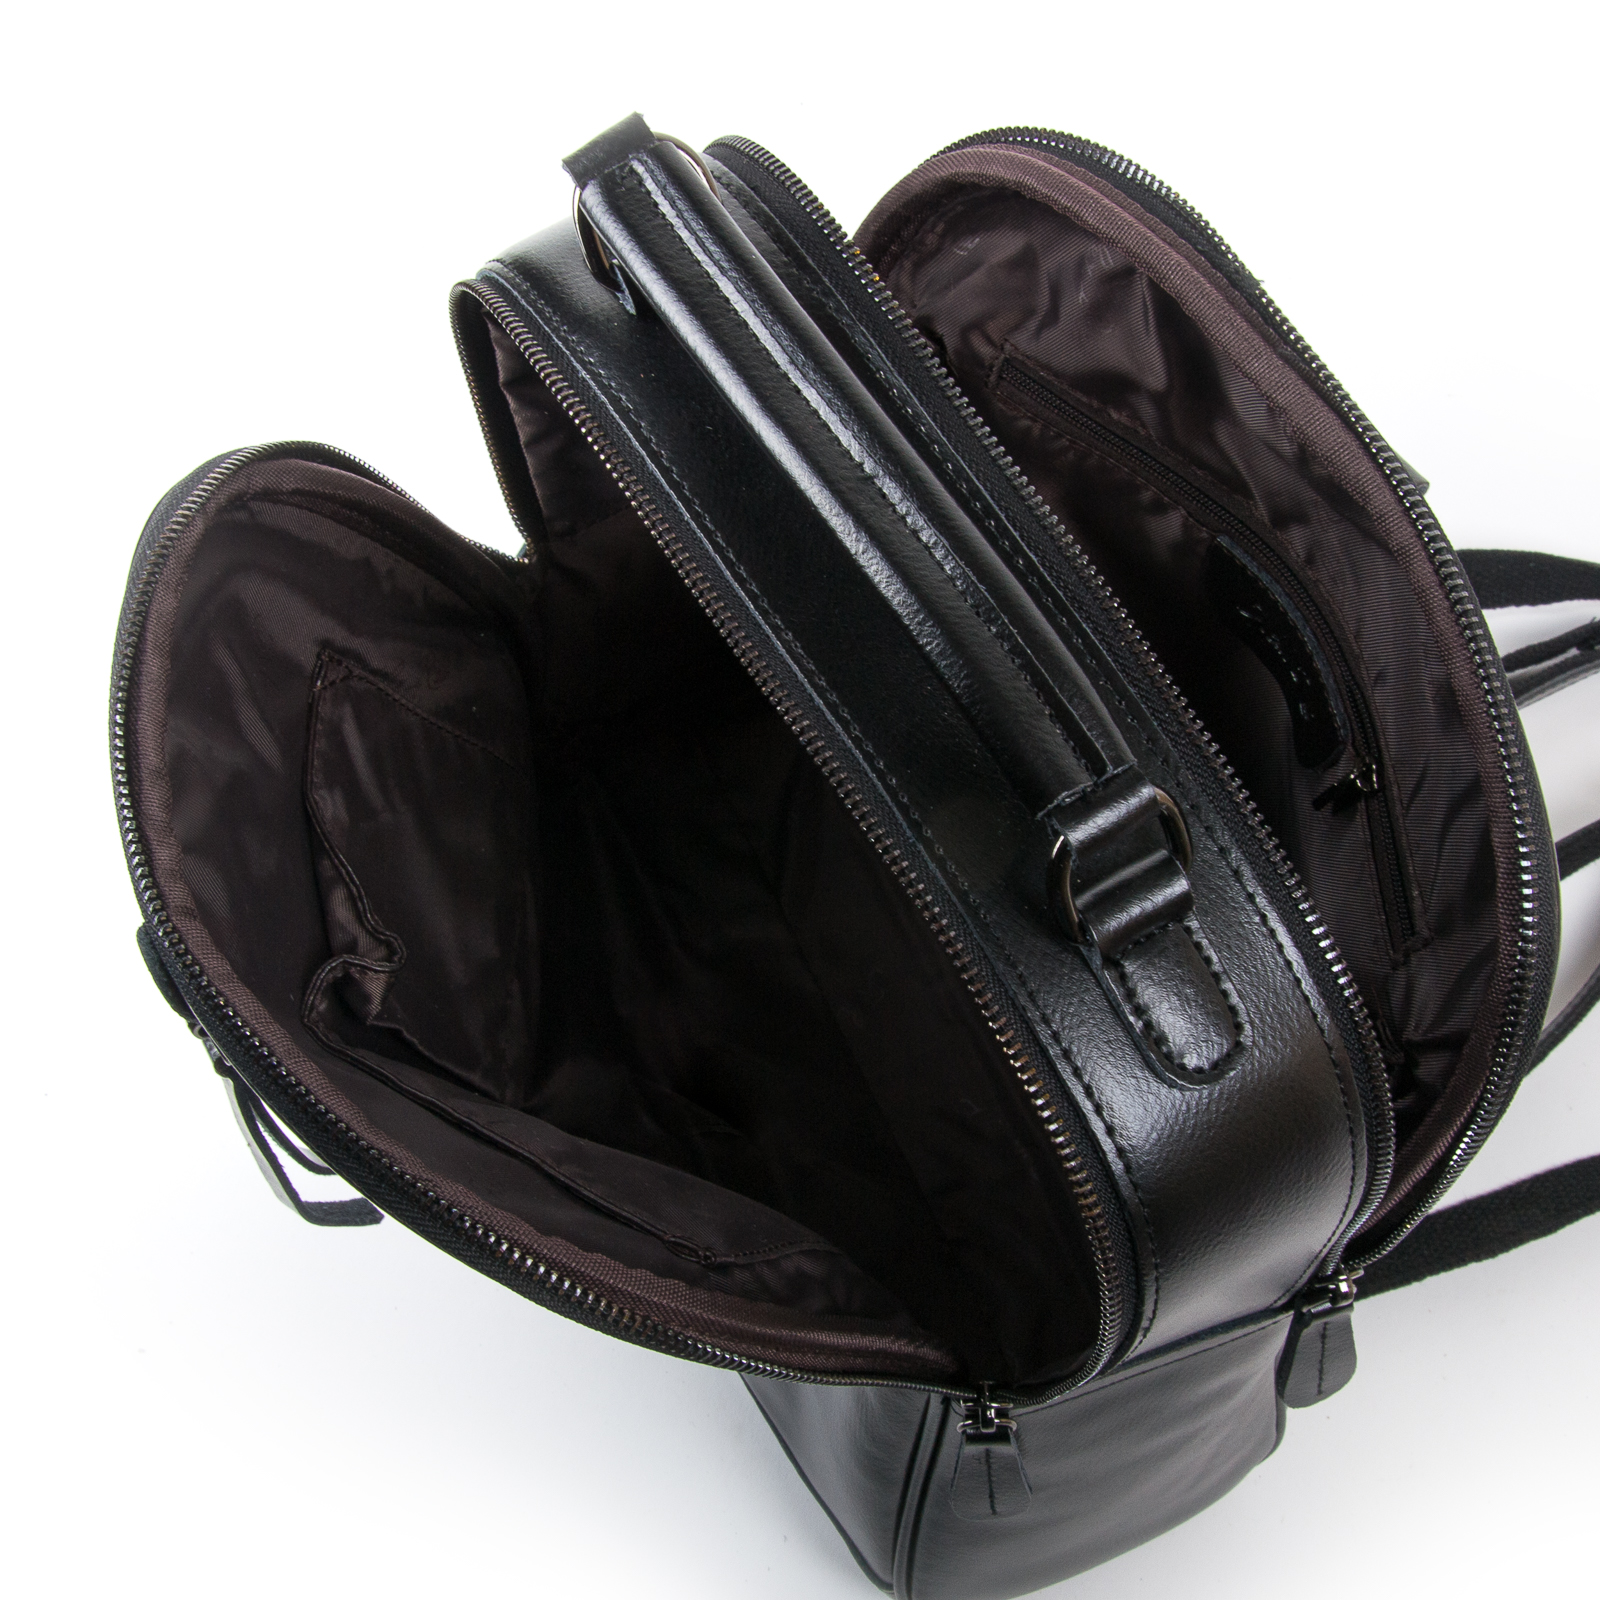 Сумка Женская Рюкзак кожа ALEX RAI 8694-3 black - фото 5